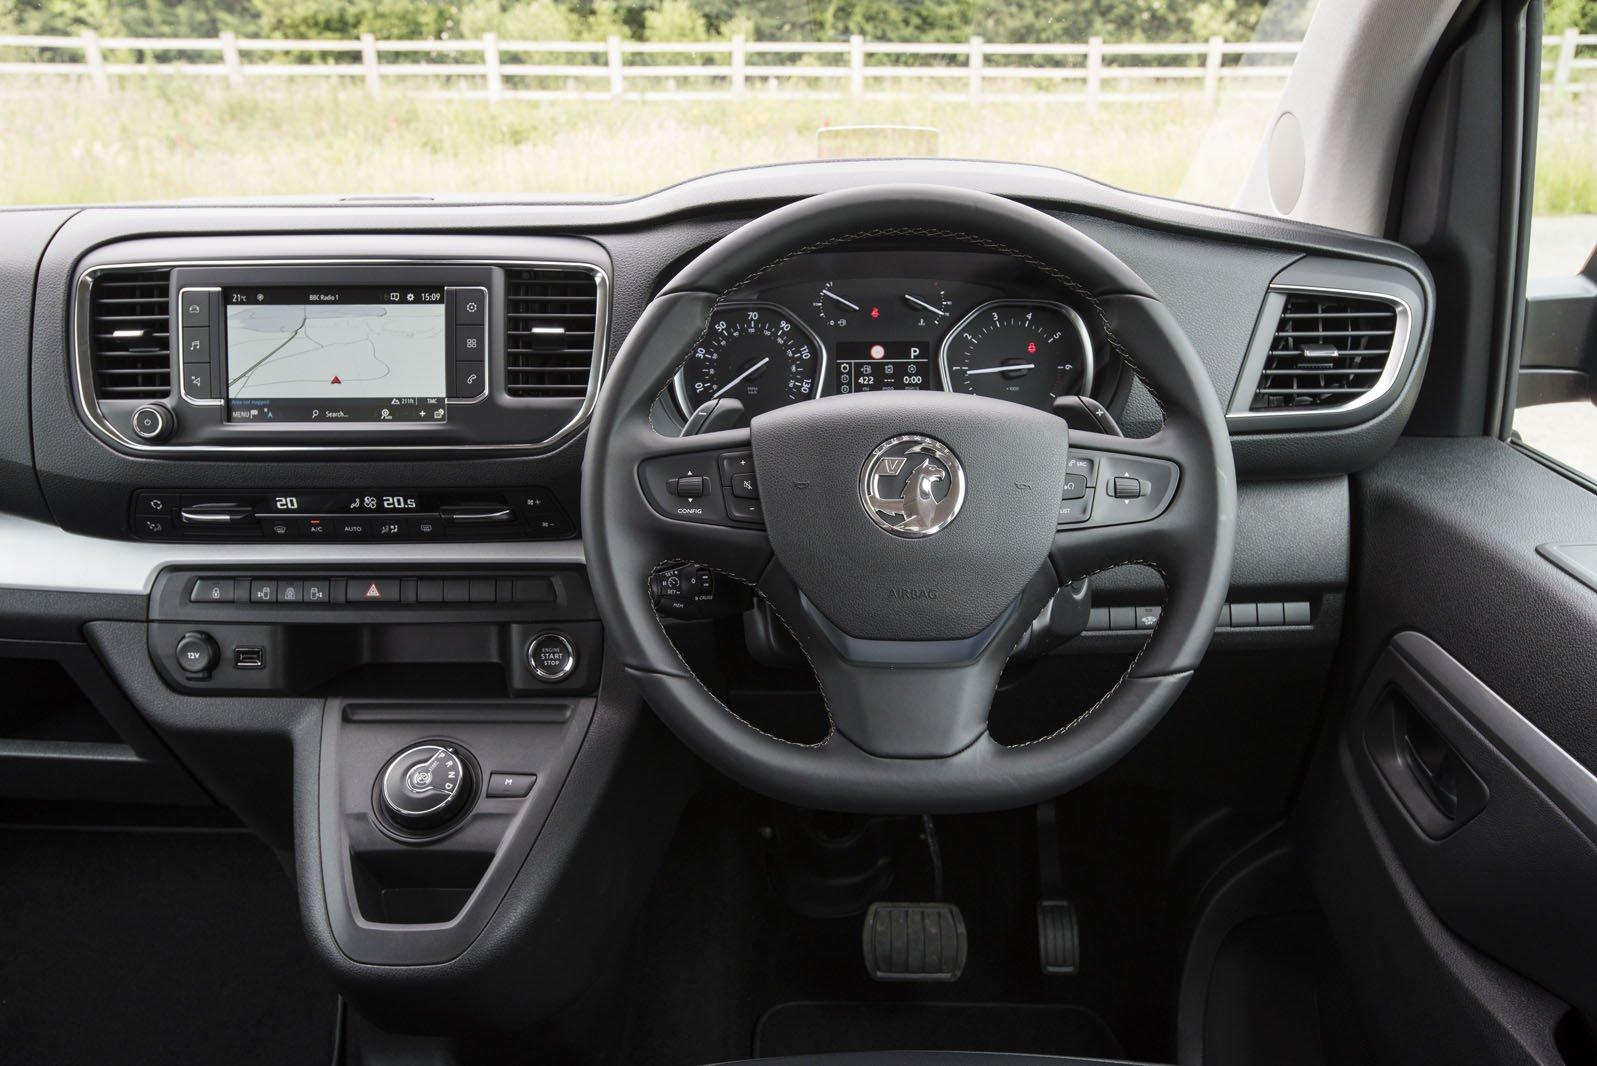 Vauxhall Vivaro Life 2019 RHD dashboard